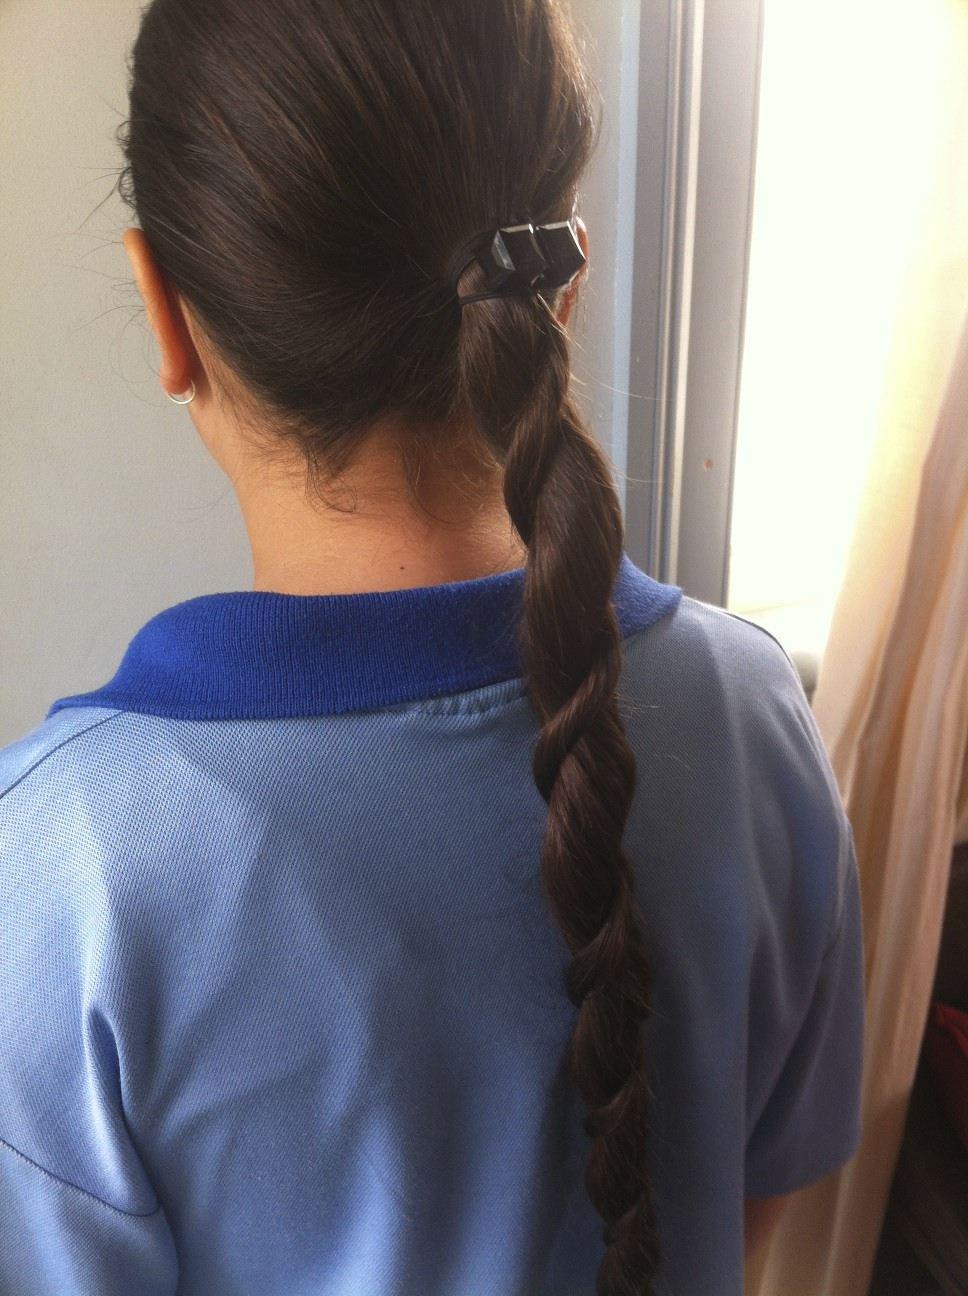 Outstanding Uneven Twister Ponytail Rapunzel39S Mother Short Hairstyles For Black Women Fulllsitofus